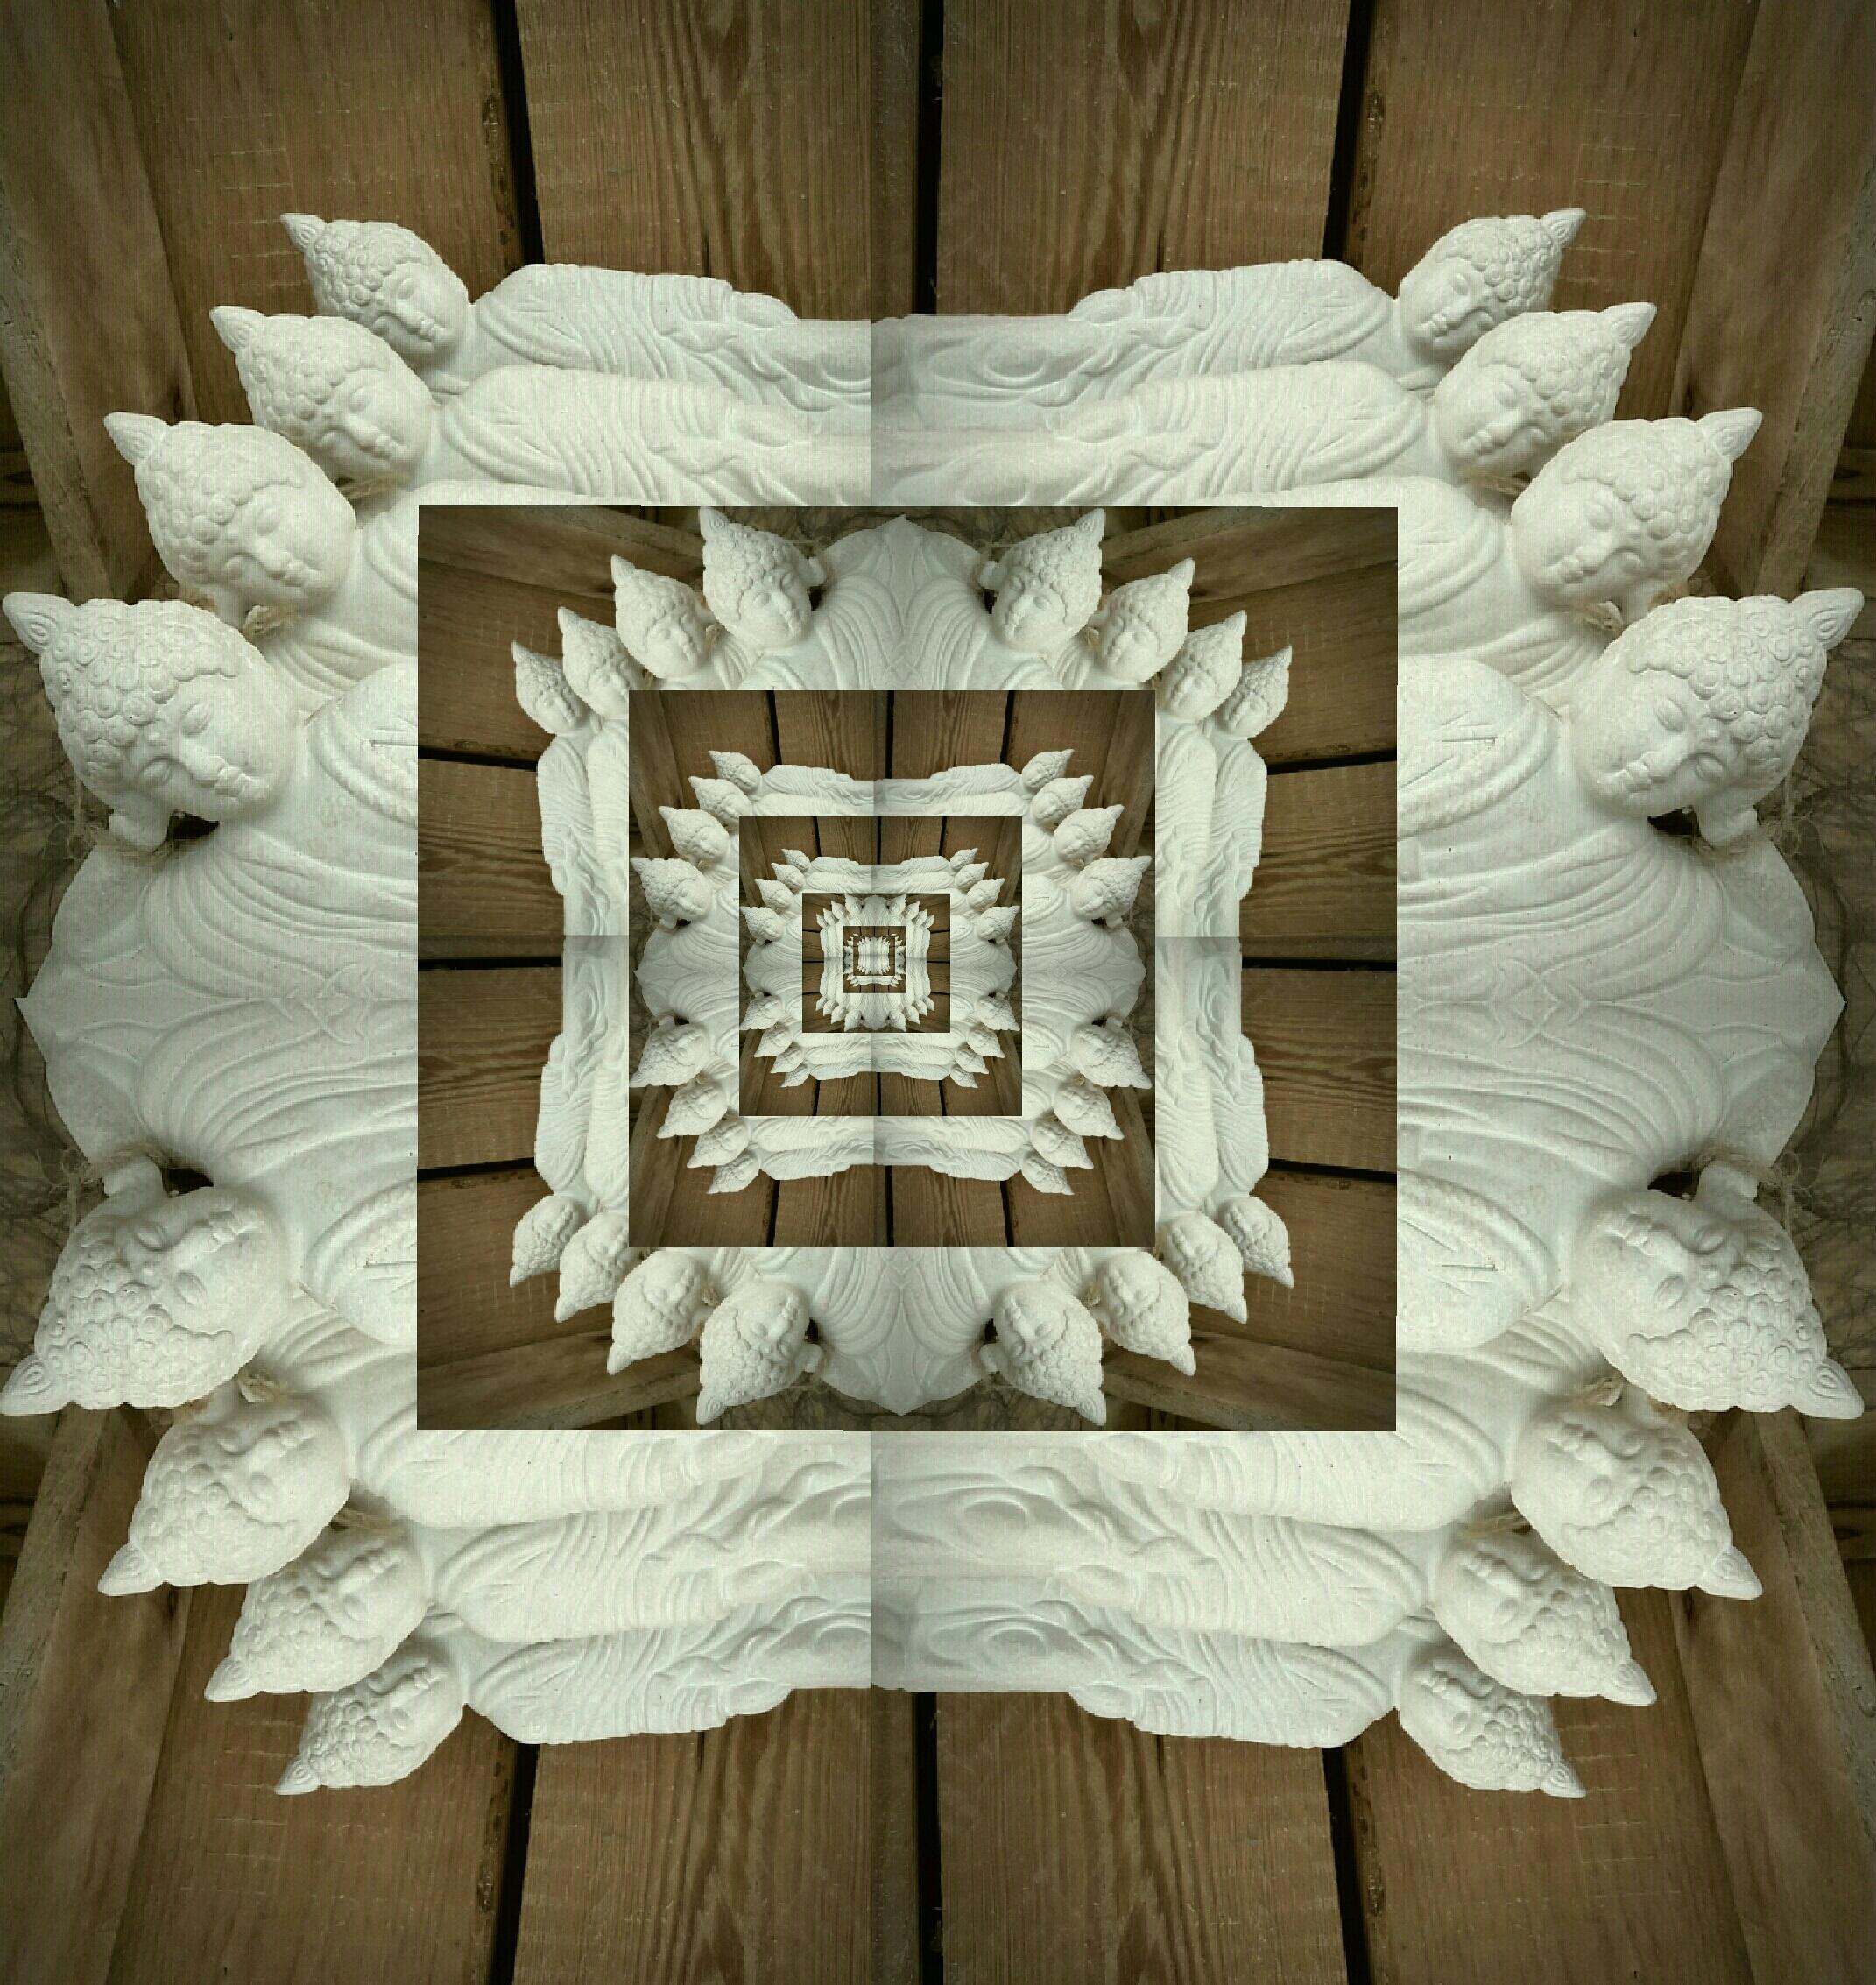 Fotos gratis : madera, blanco, mueble, material, textil, escultura ...